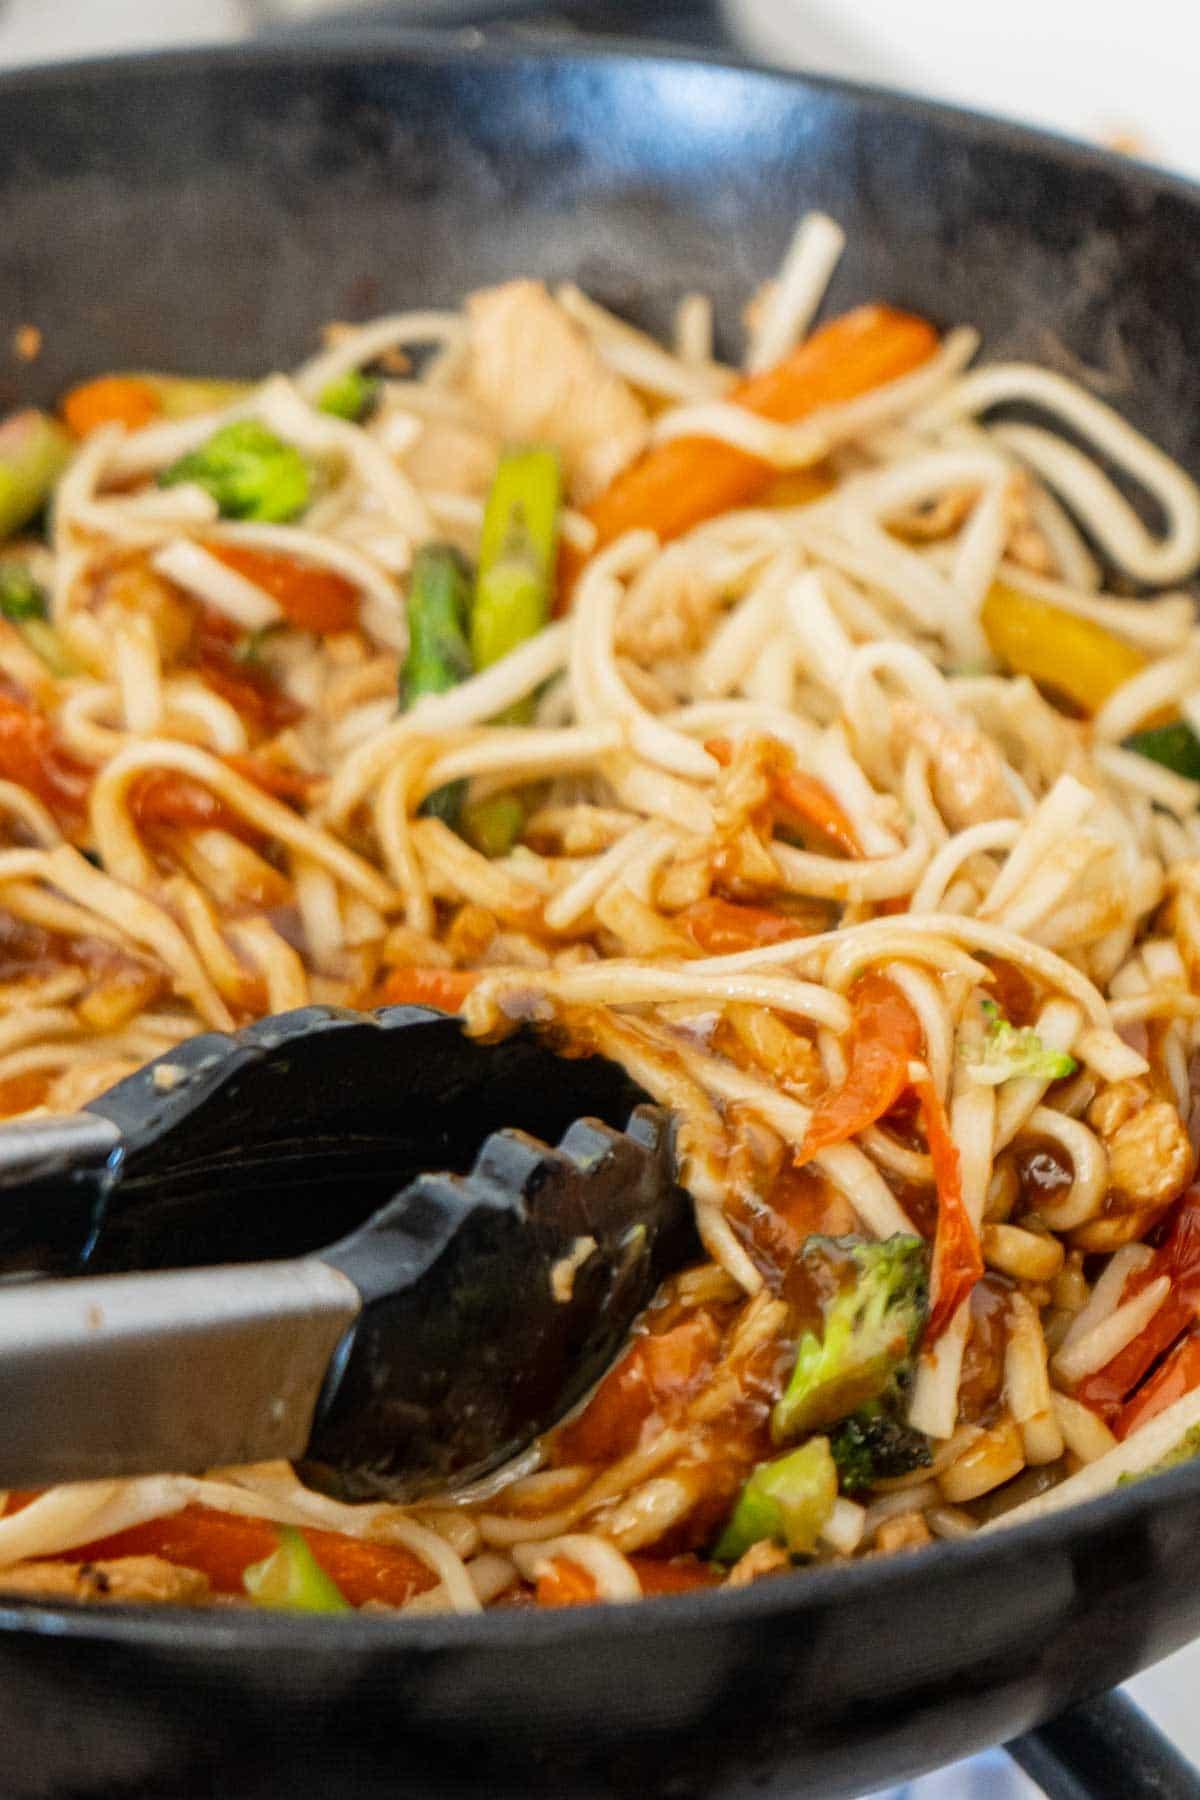 Teriyaki chicken stir fry in a wok